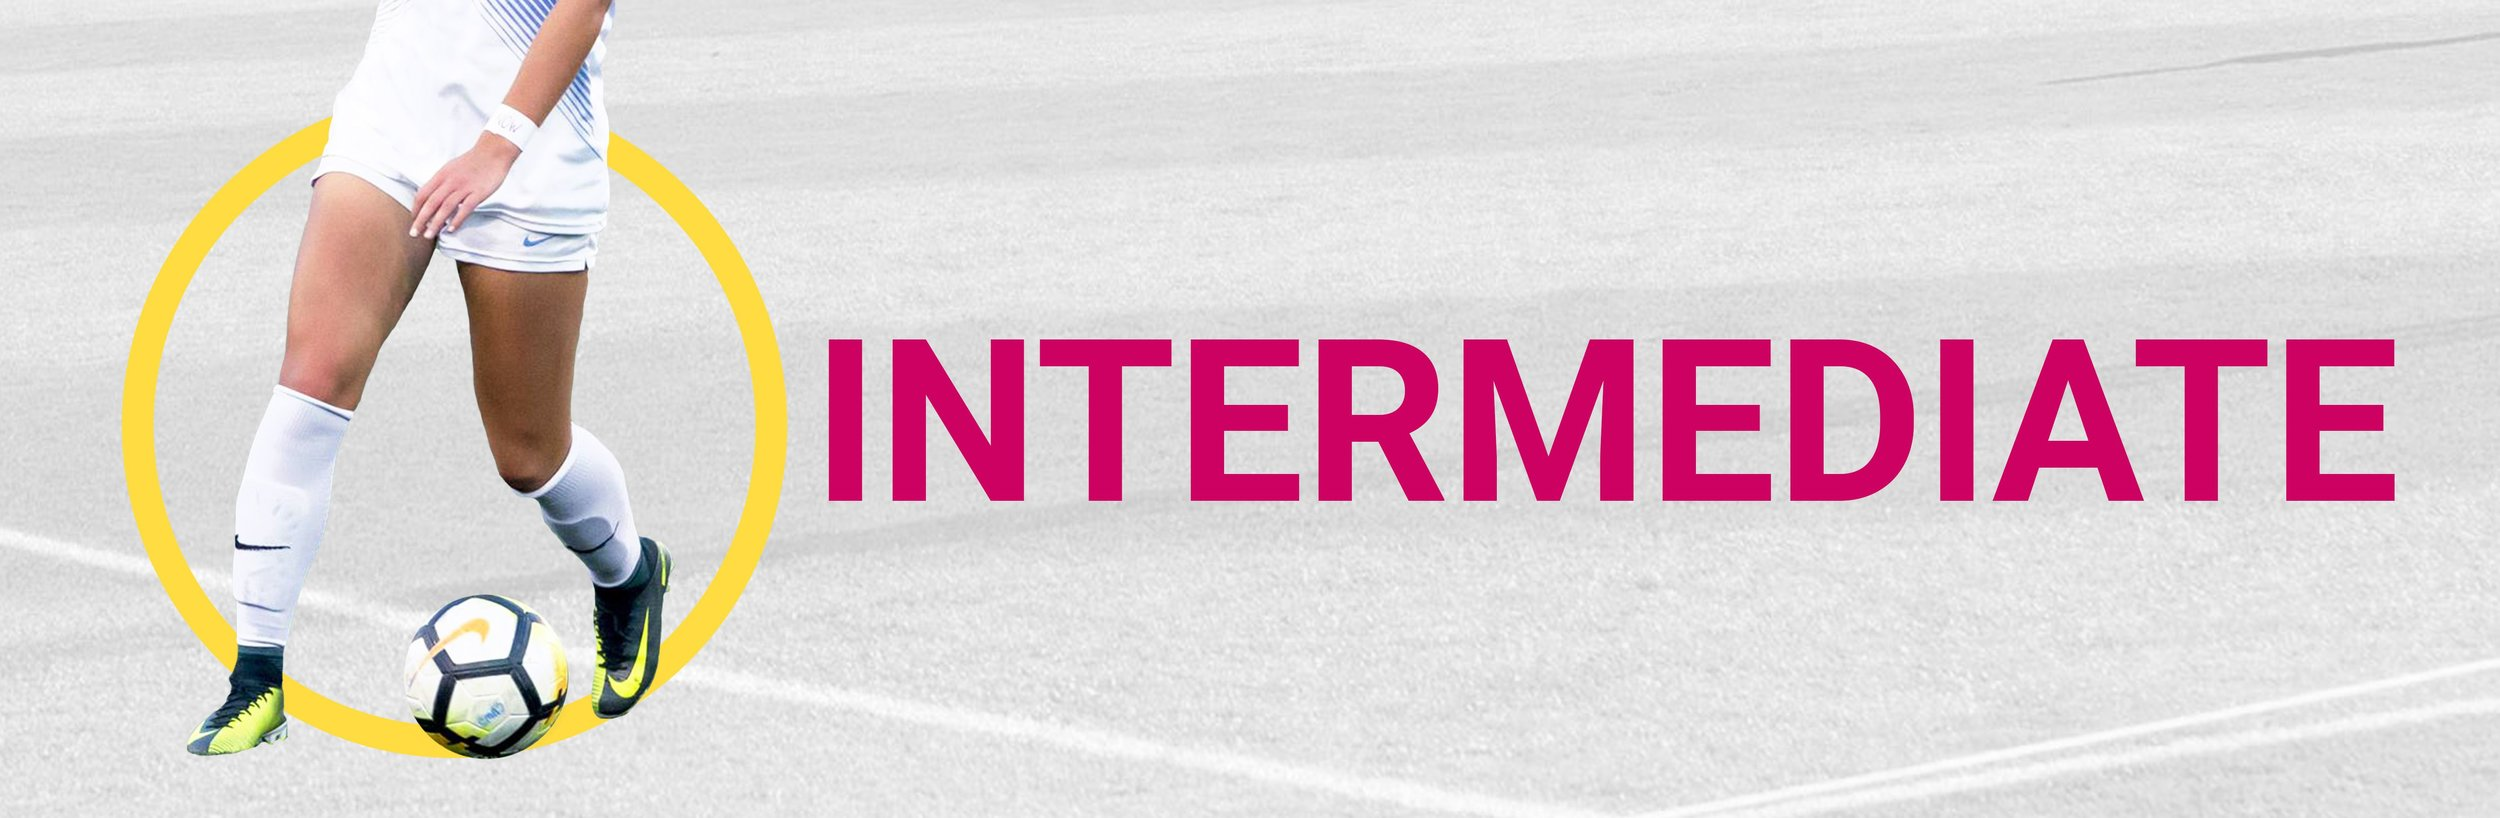 WSC Intermediate Spring 2019 Soccer Sign Up.jpg